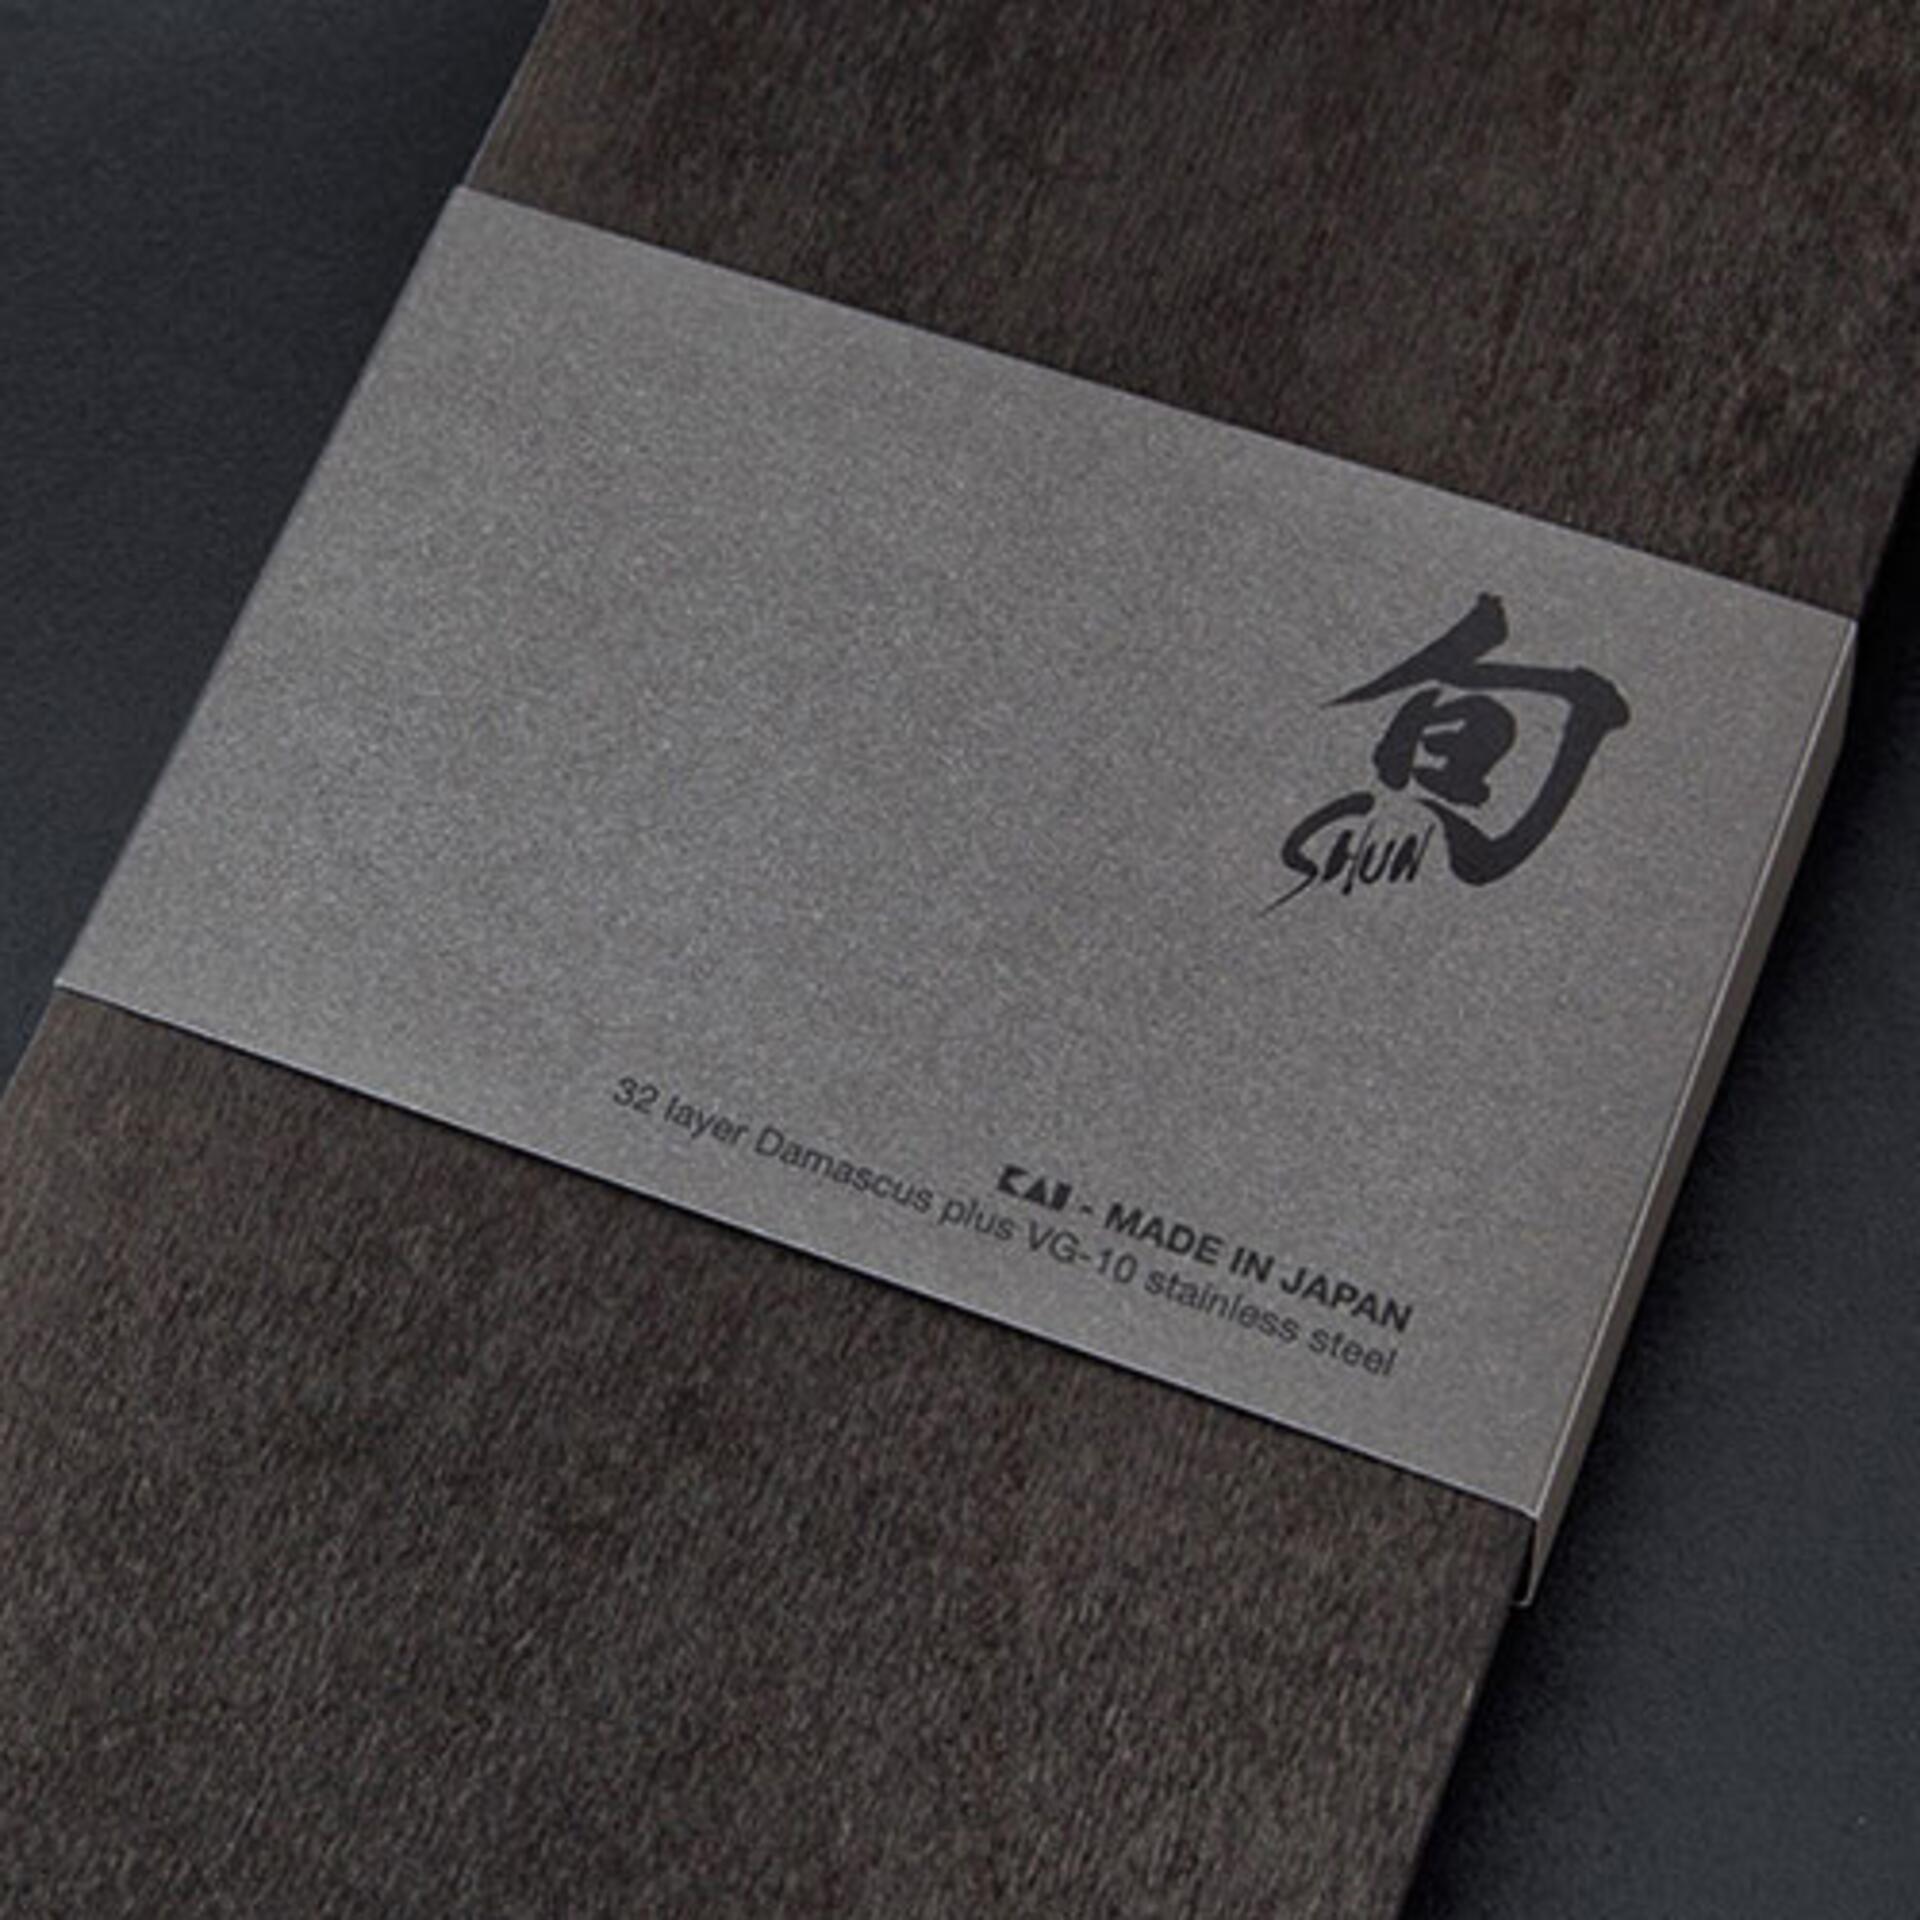 KAI Shun Classic Nakiri DM-0728